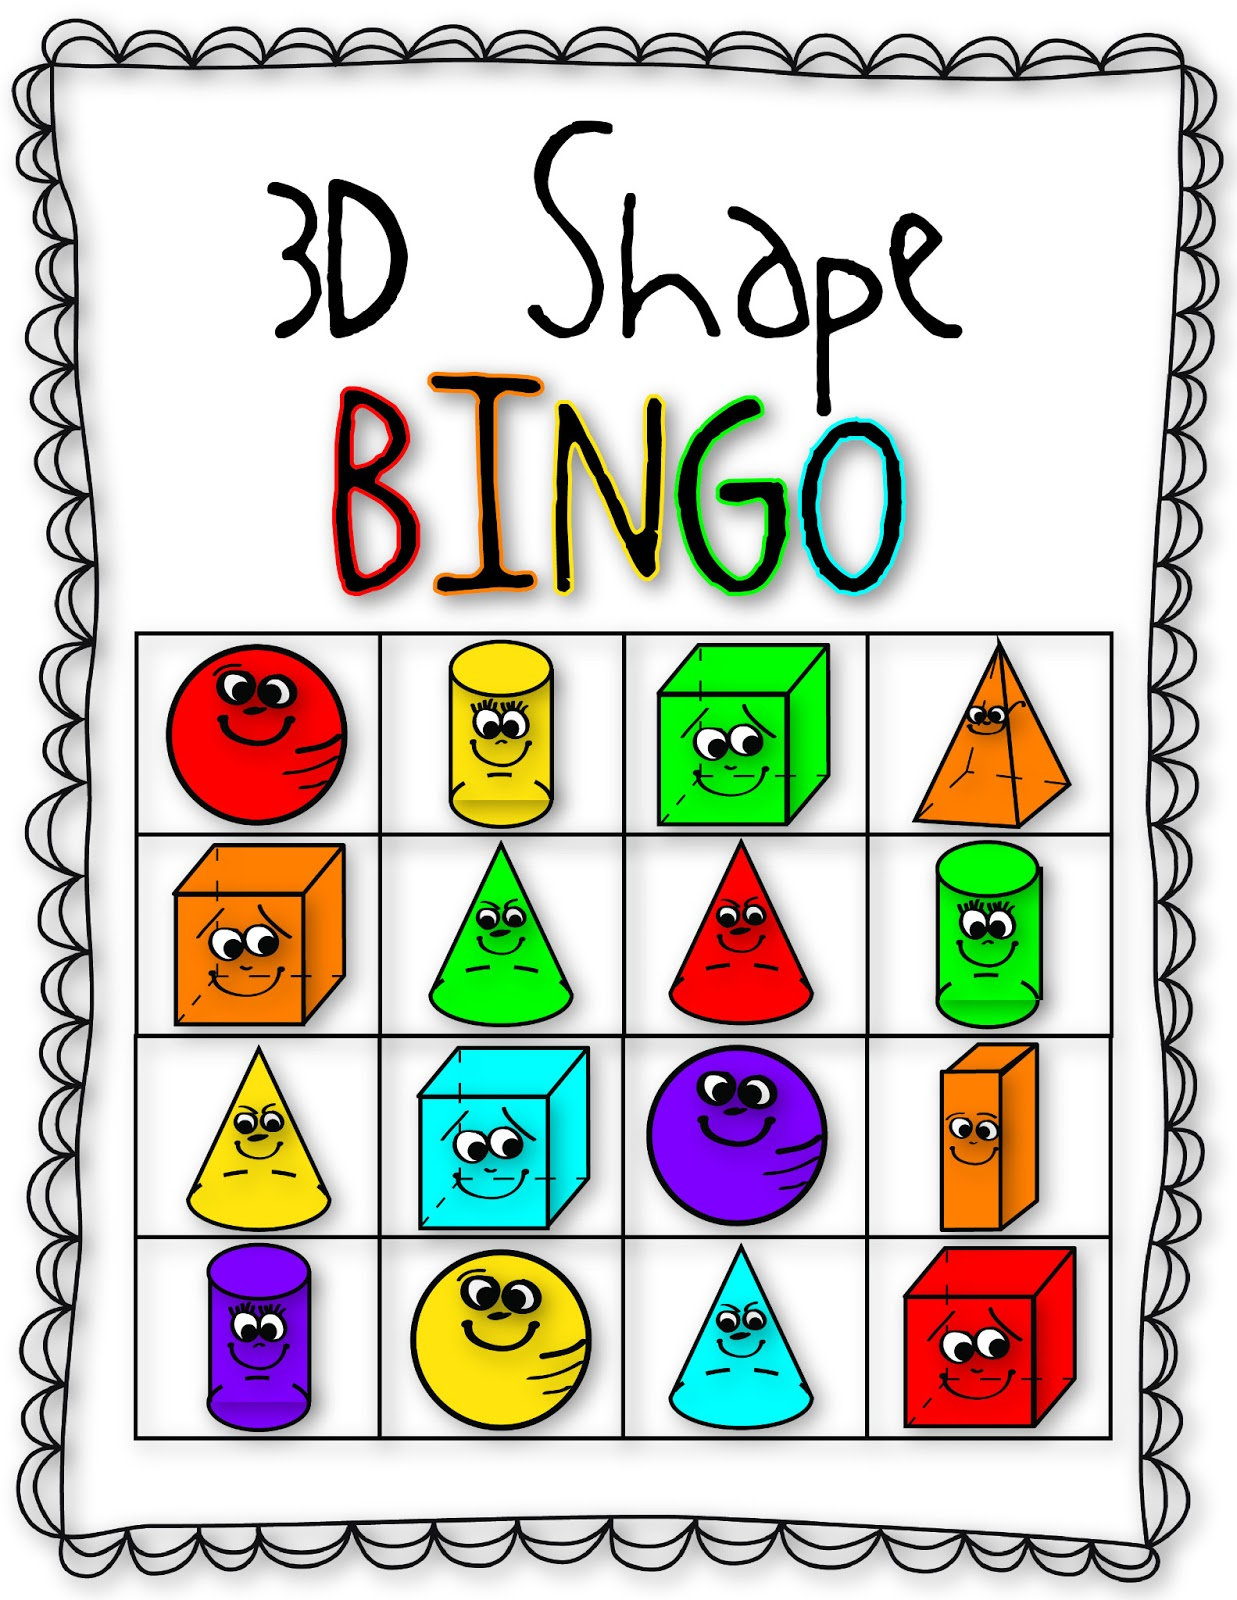 Free 3D Shape Cliparts, Download Free Clip Art, Free Clip.